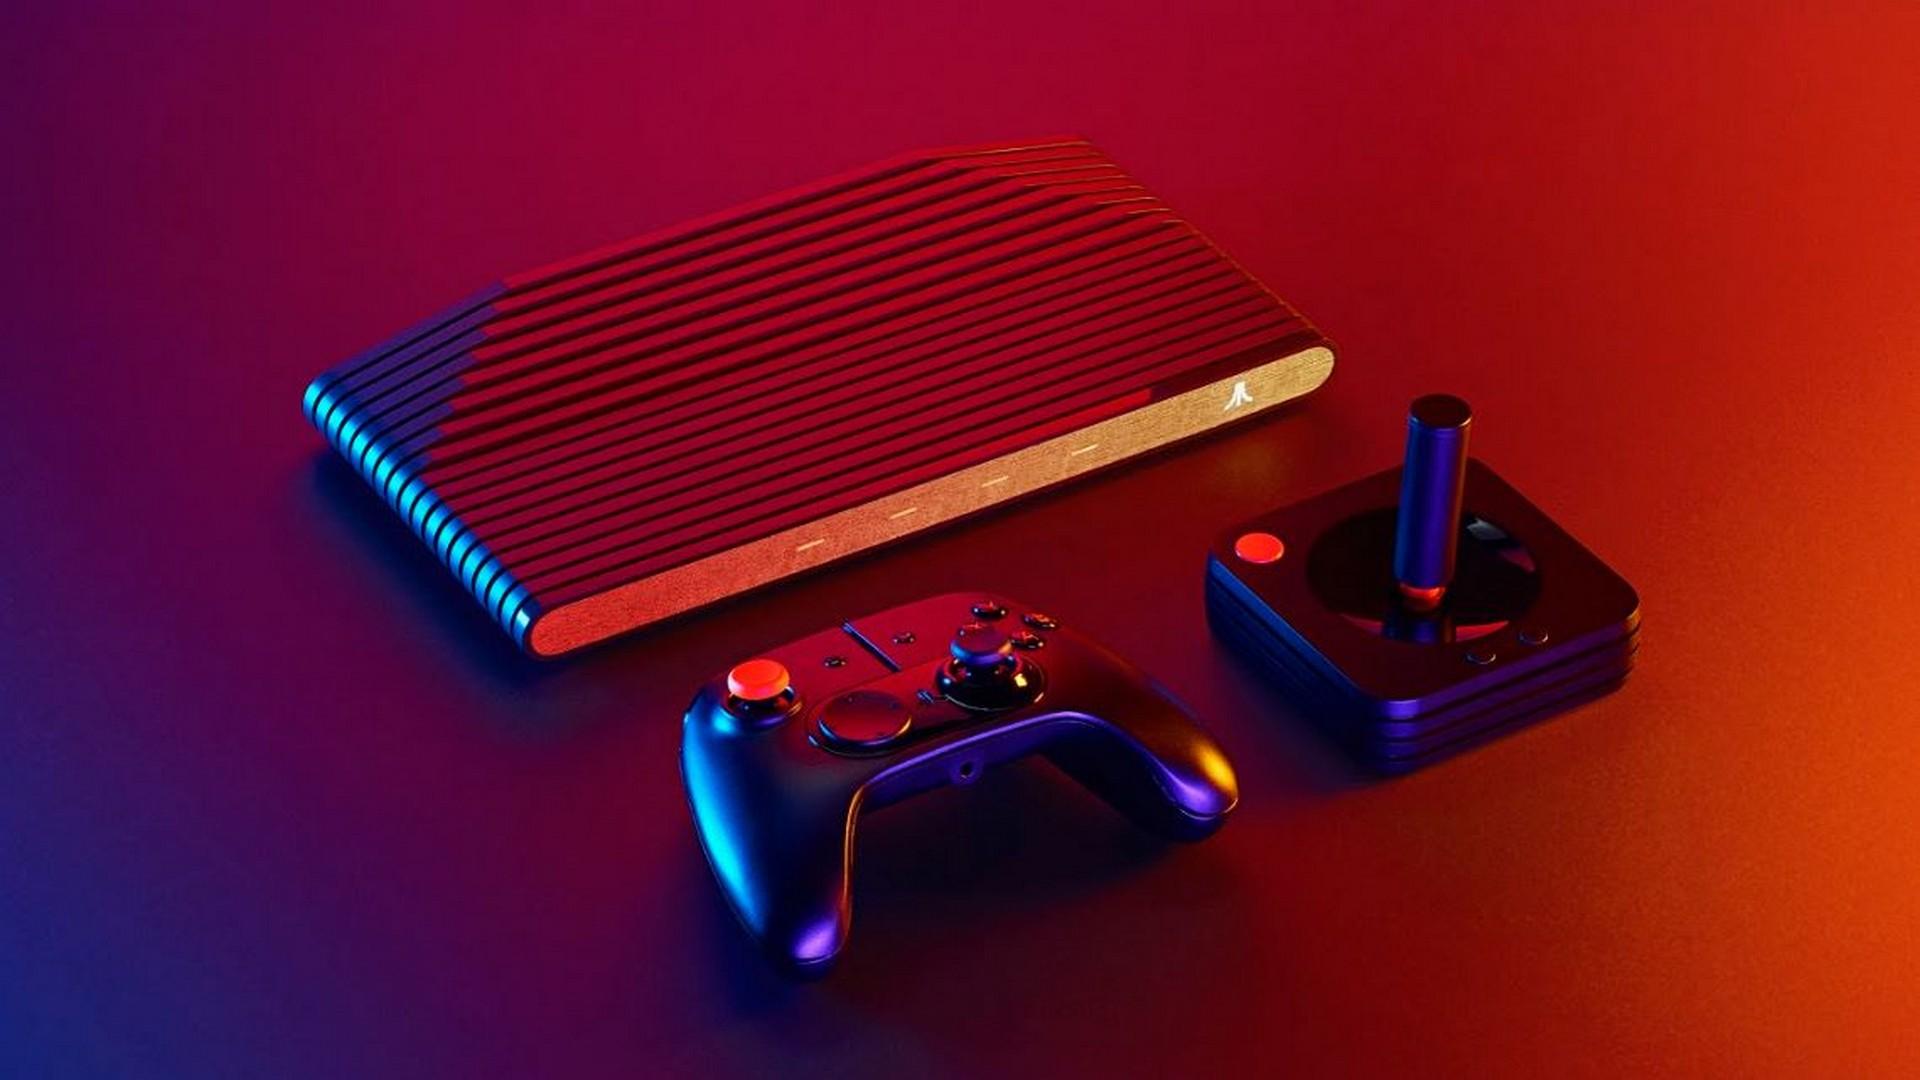 Atari Names Bluemouth Interactive as Australian Distribution Partner For Atari VCS Video Computer System